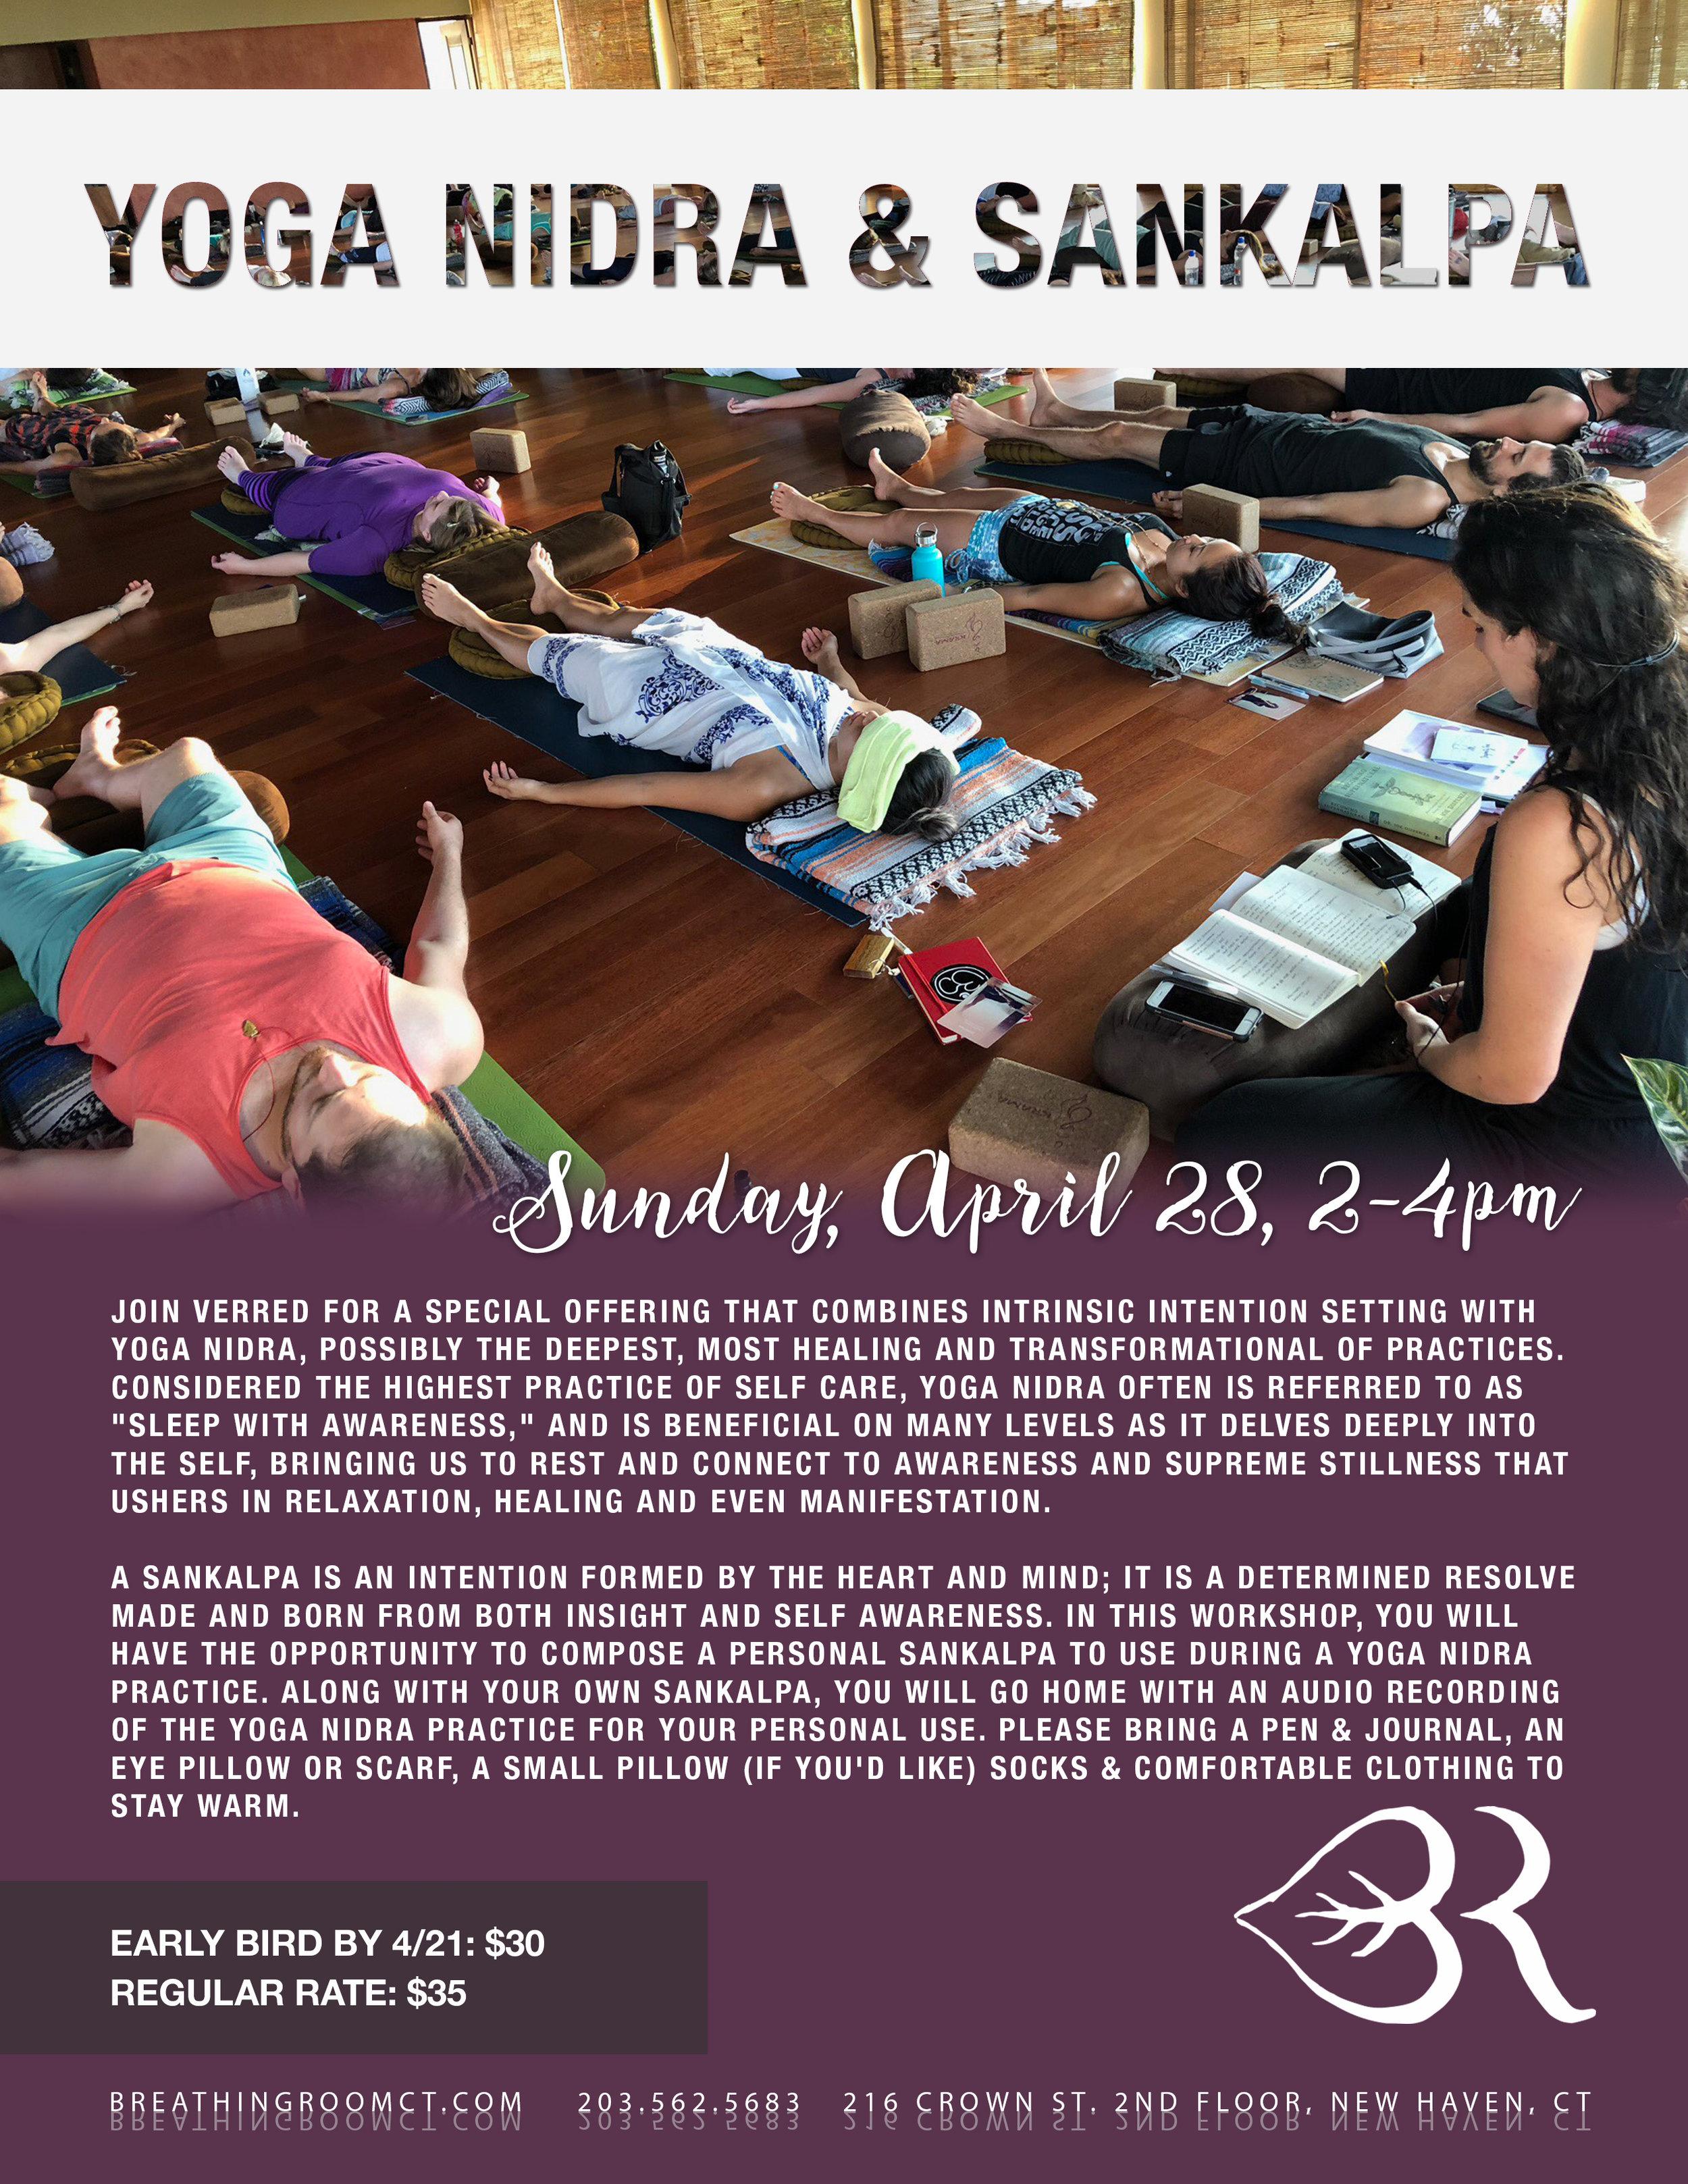 BRYC FLYER Verred Yoga Nidra Sankalpa 2019 (1).jpg